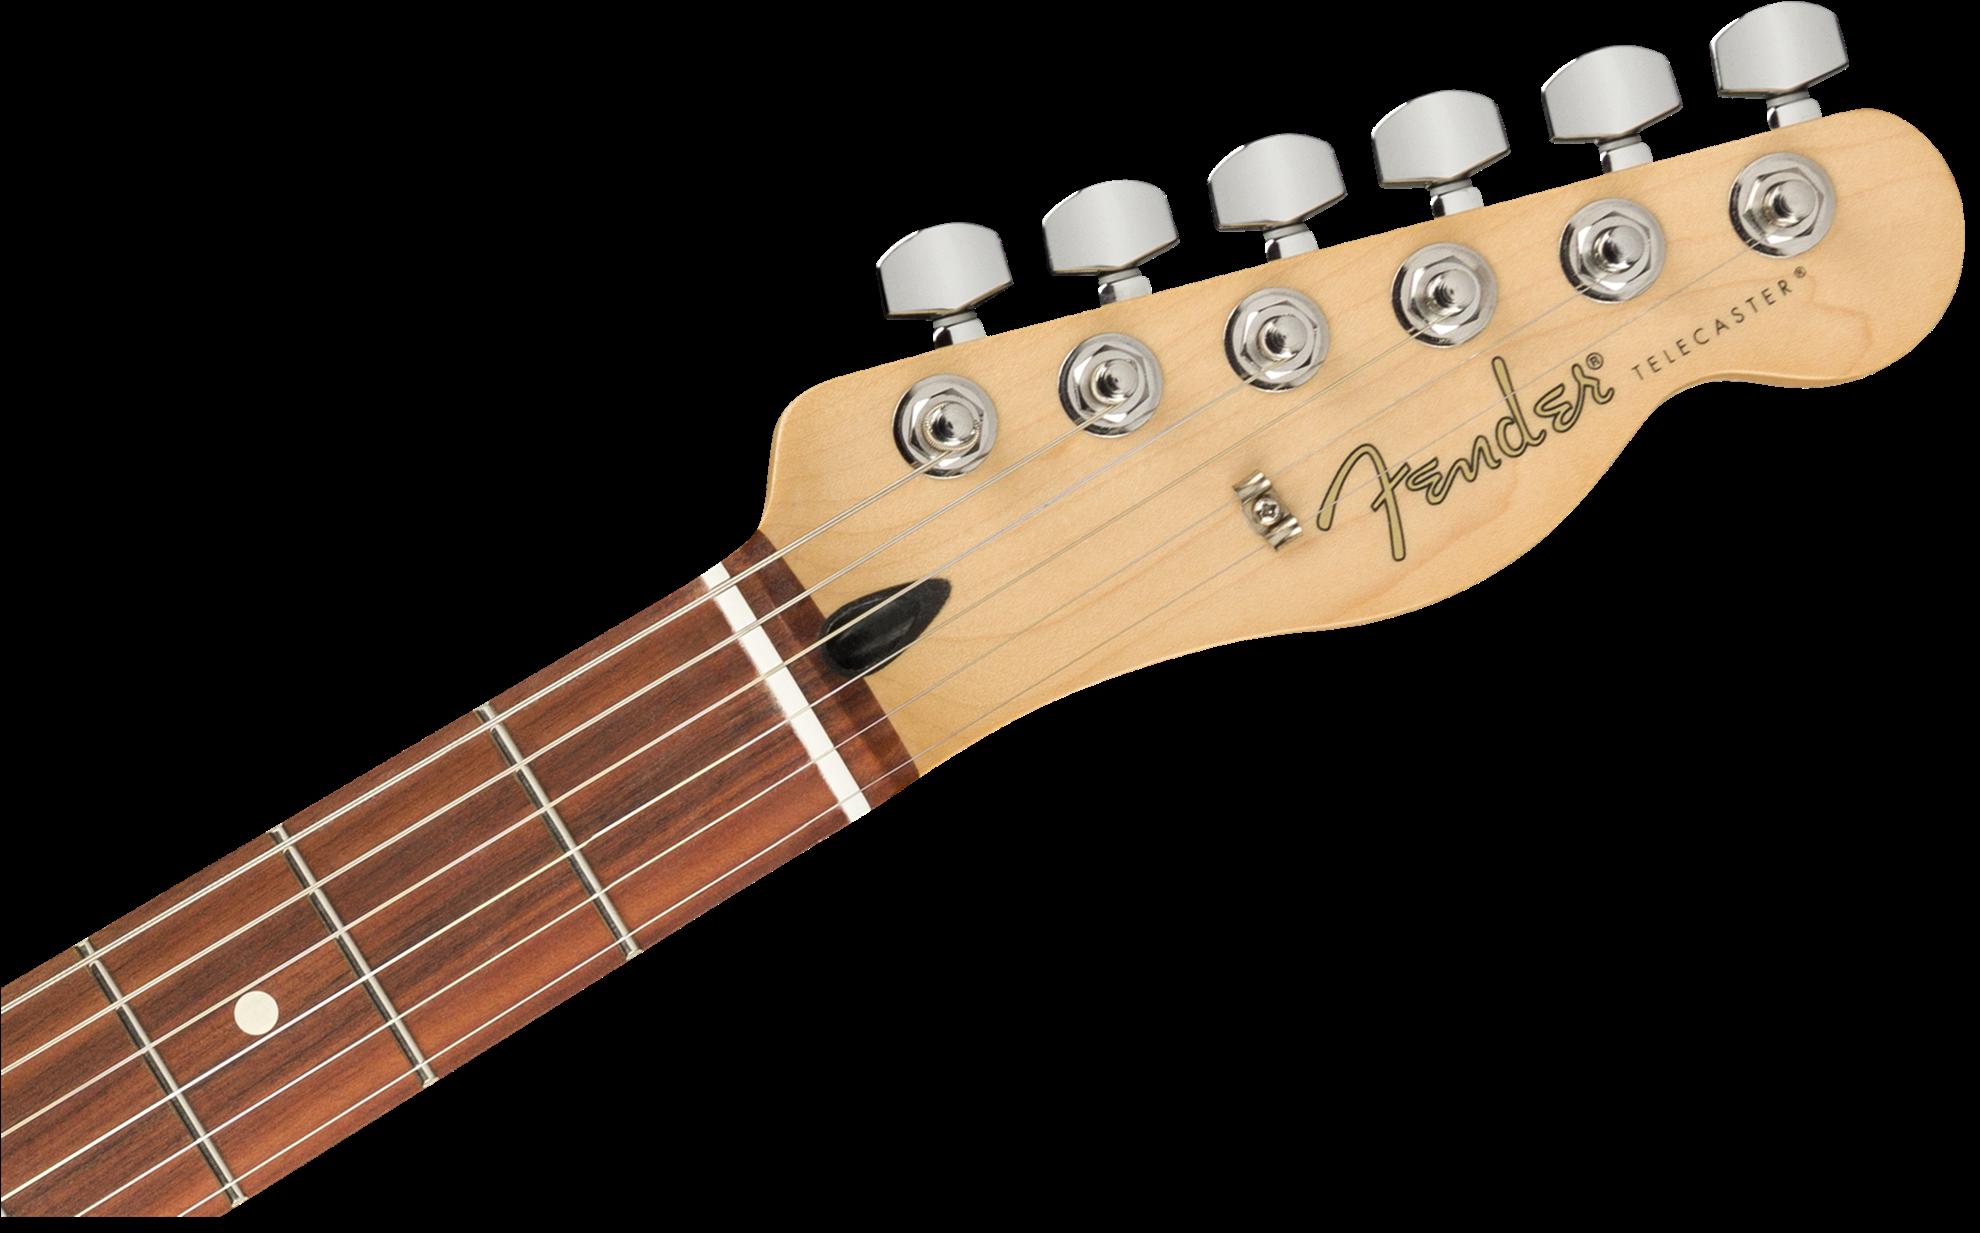 fender player telecaster electric guitar pau ferro fretboard 3 colour sunburst perth. Black Bedroom Furniture Sets. Home Design Ideas